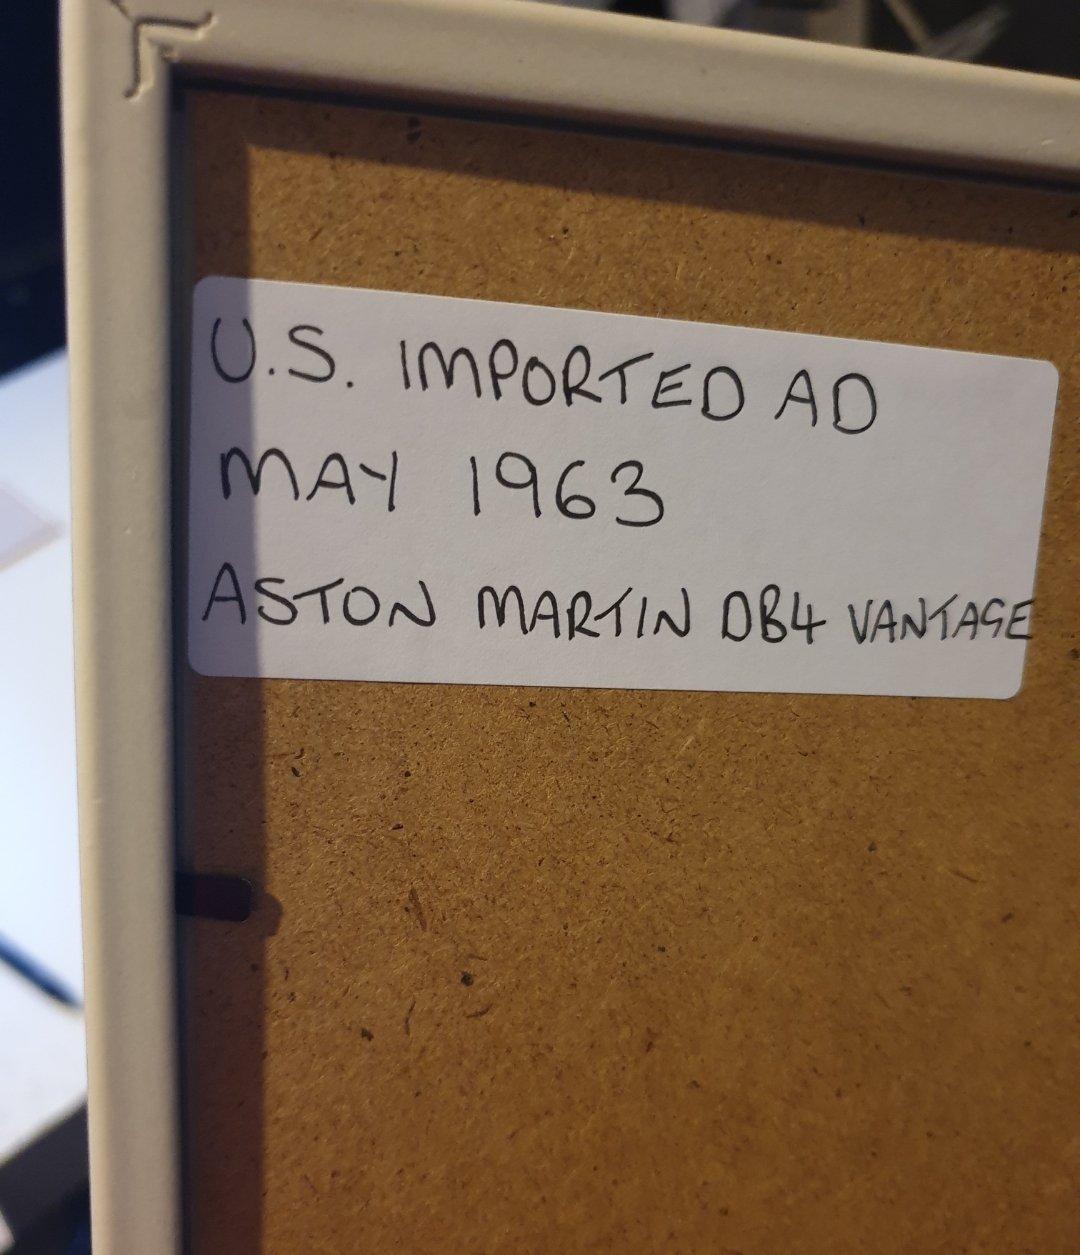 1963 Aston Martin DB4 Vantage Advert Original  SOLD (picture 2 of 2)